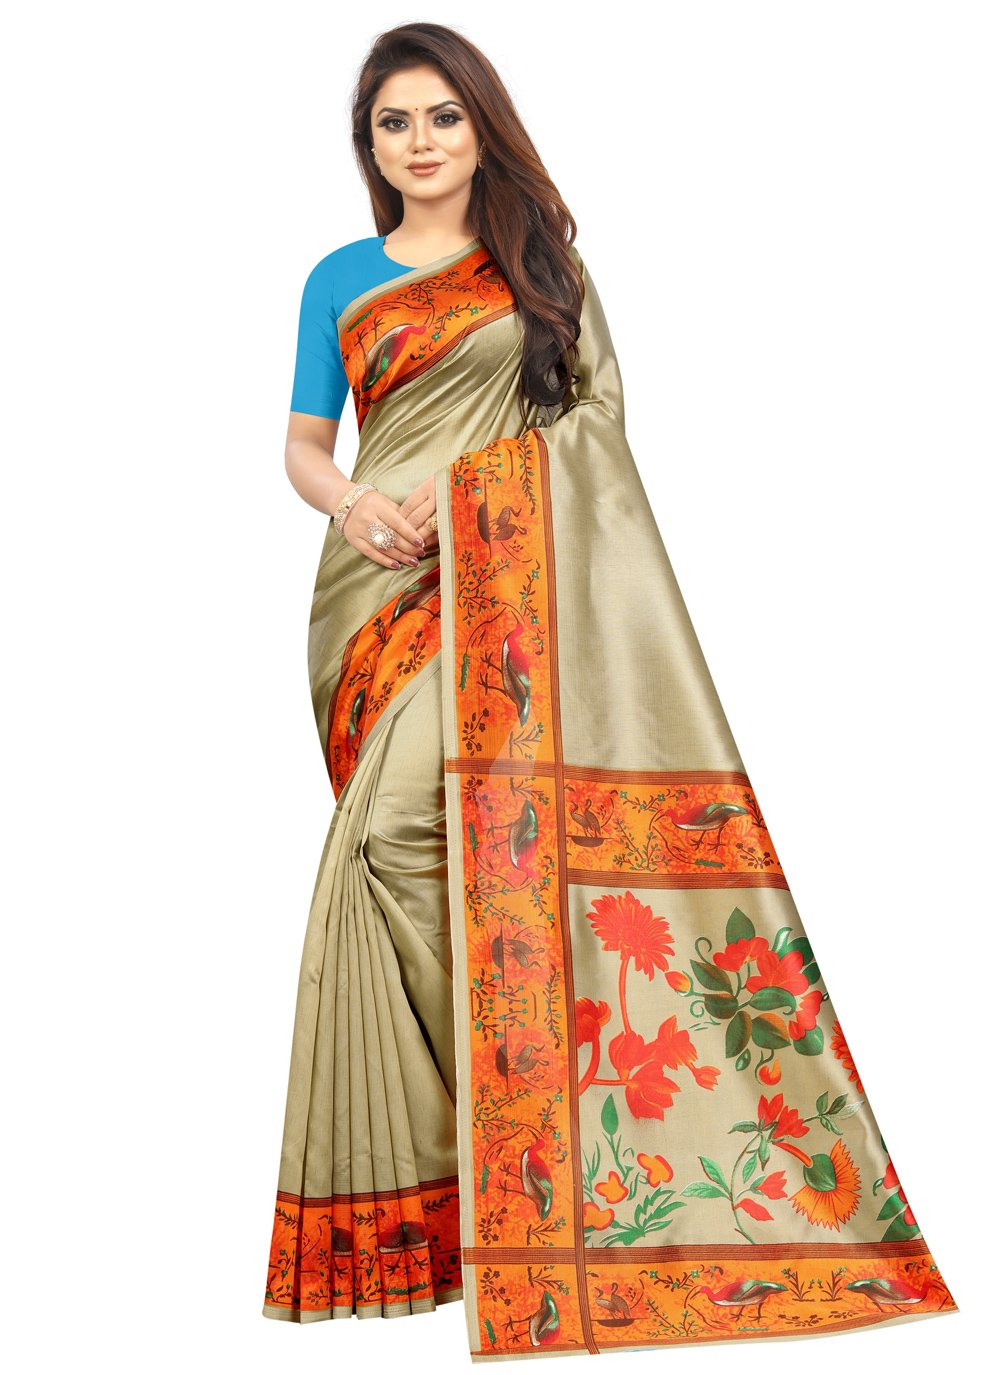 Printed Saree Abstract Print Raw Silk in Multi Colour